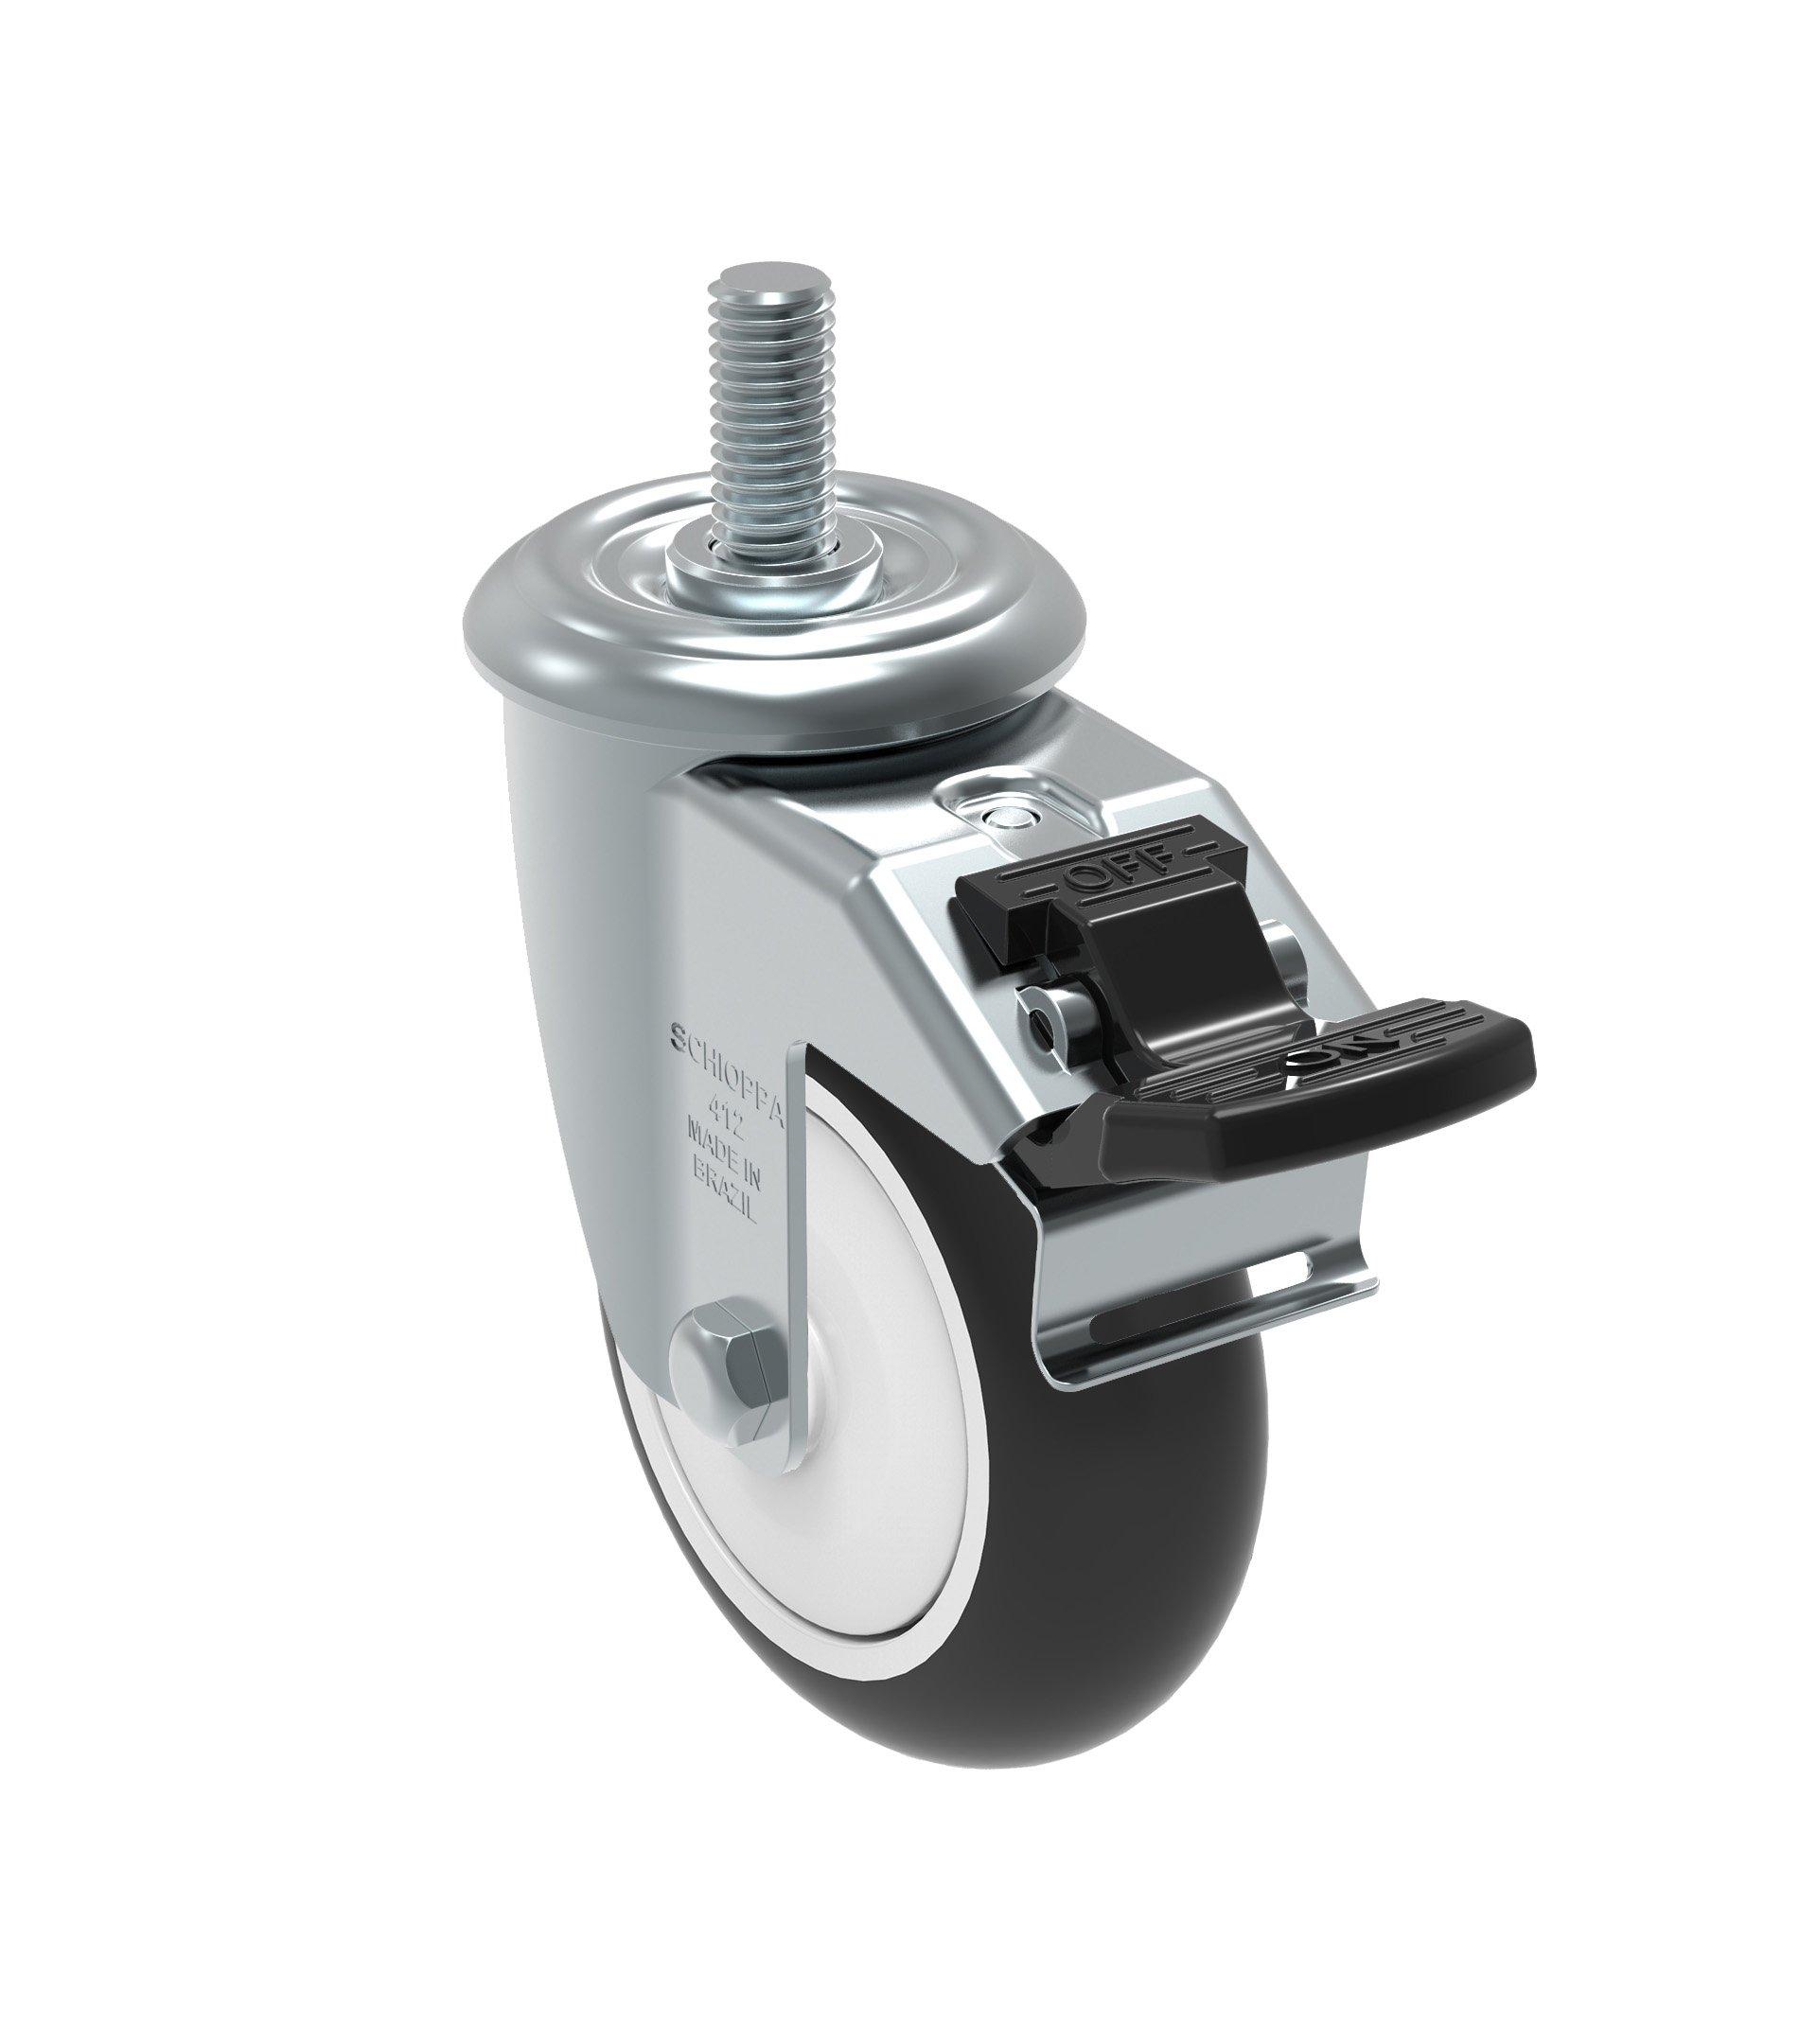 Schioppa GLEEF 412 NPE G L12 Series 4'' x 1-1/4'' Diameter Swivel Caster with Total Lock Brake, Non-Marking Polypropylene Precision Ball Bearing Wheel, 3/8'' Diameter x 1-1/2'' Length Threaded Stem, 275 lb